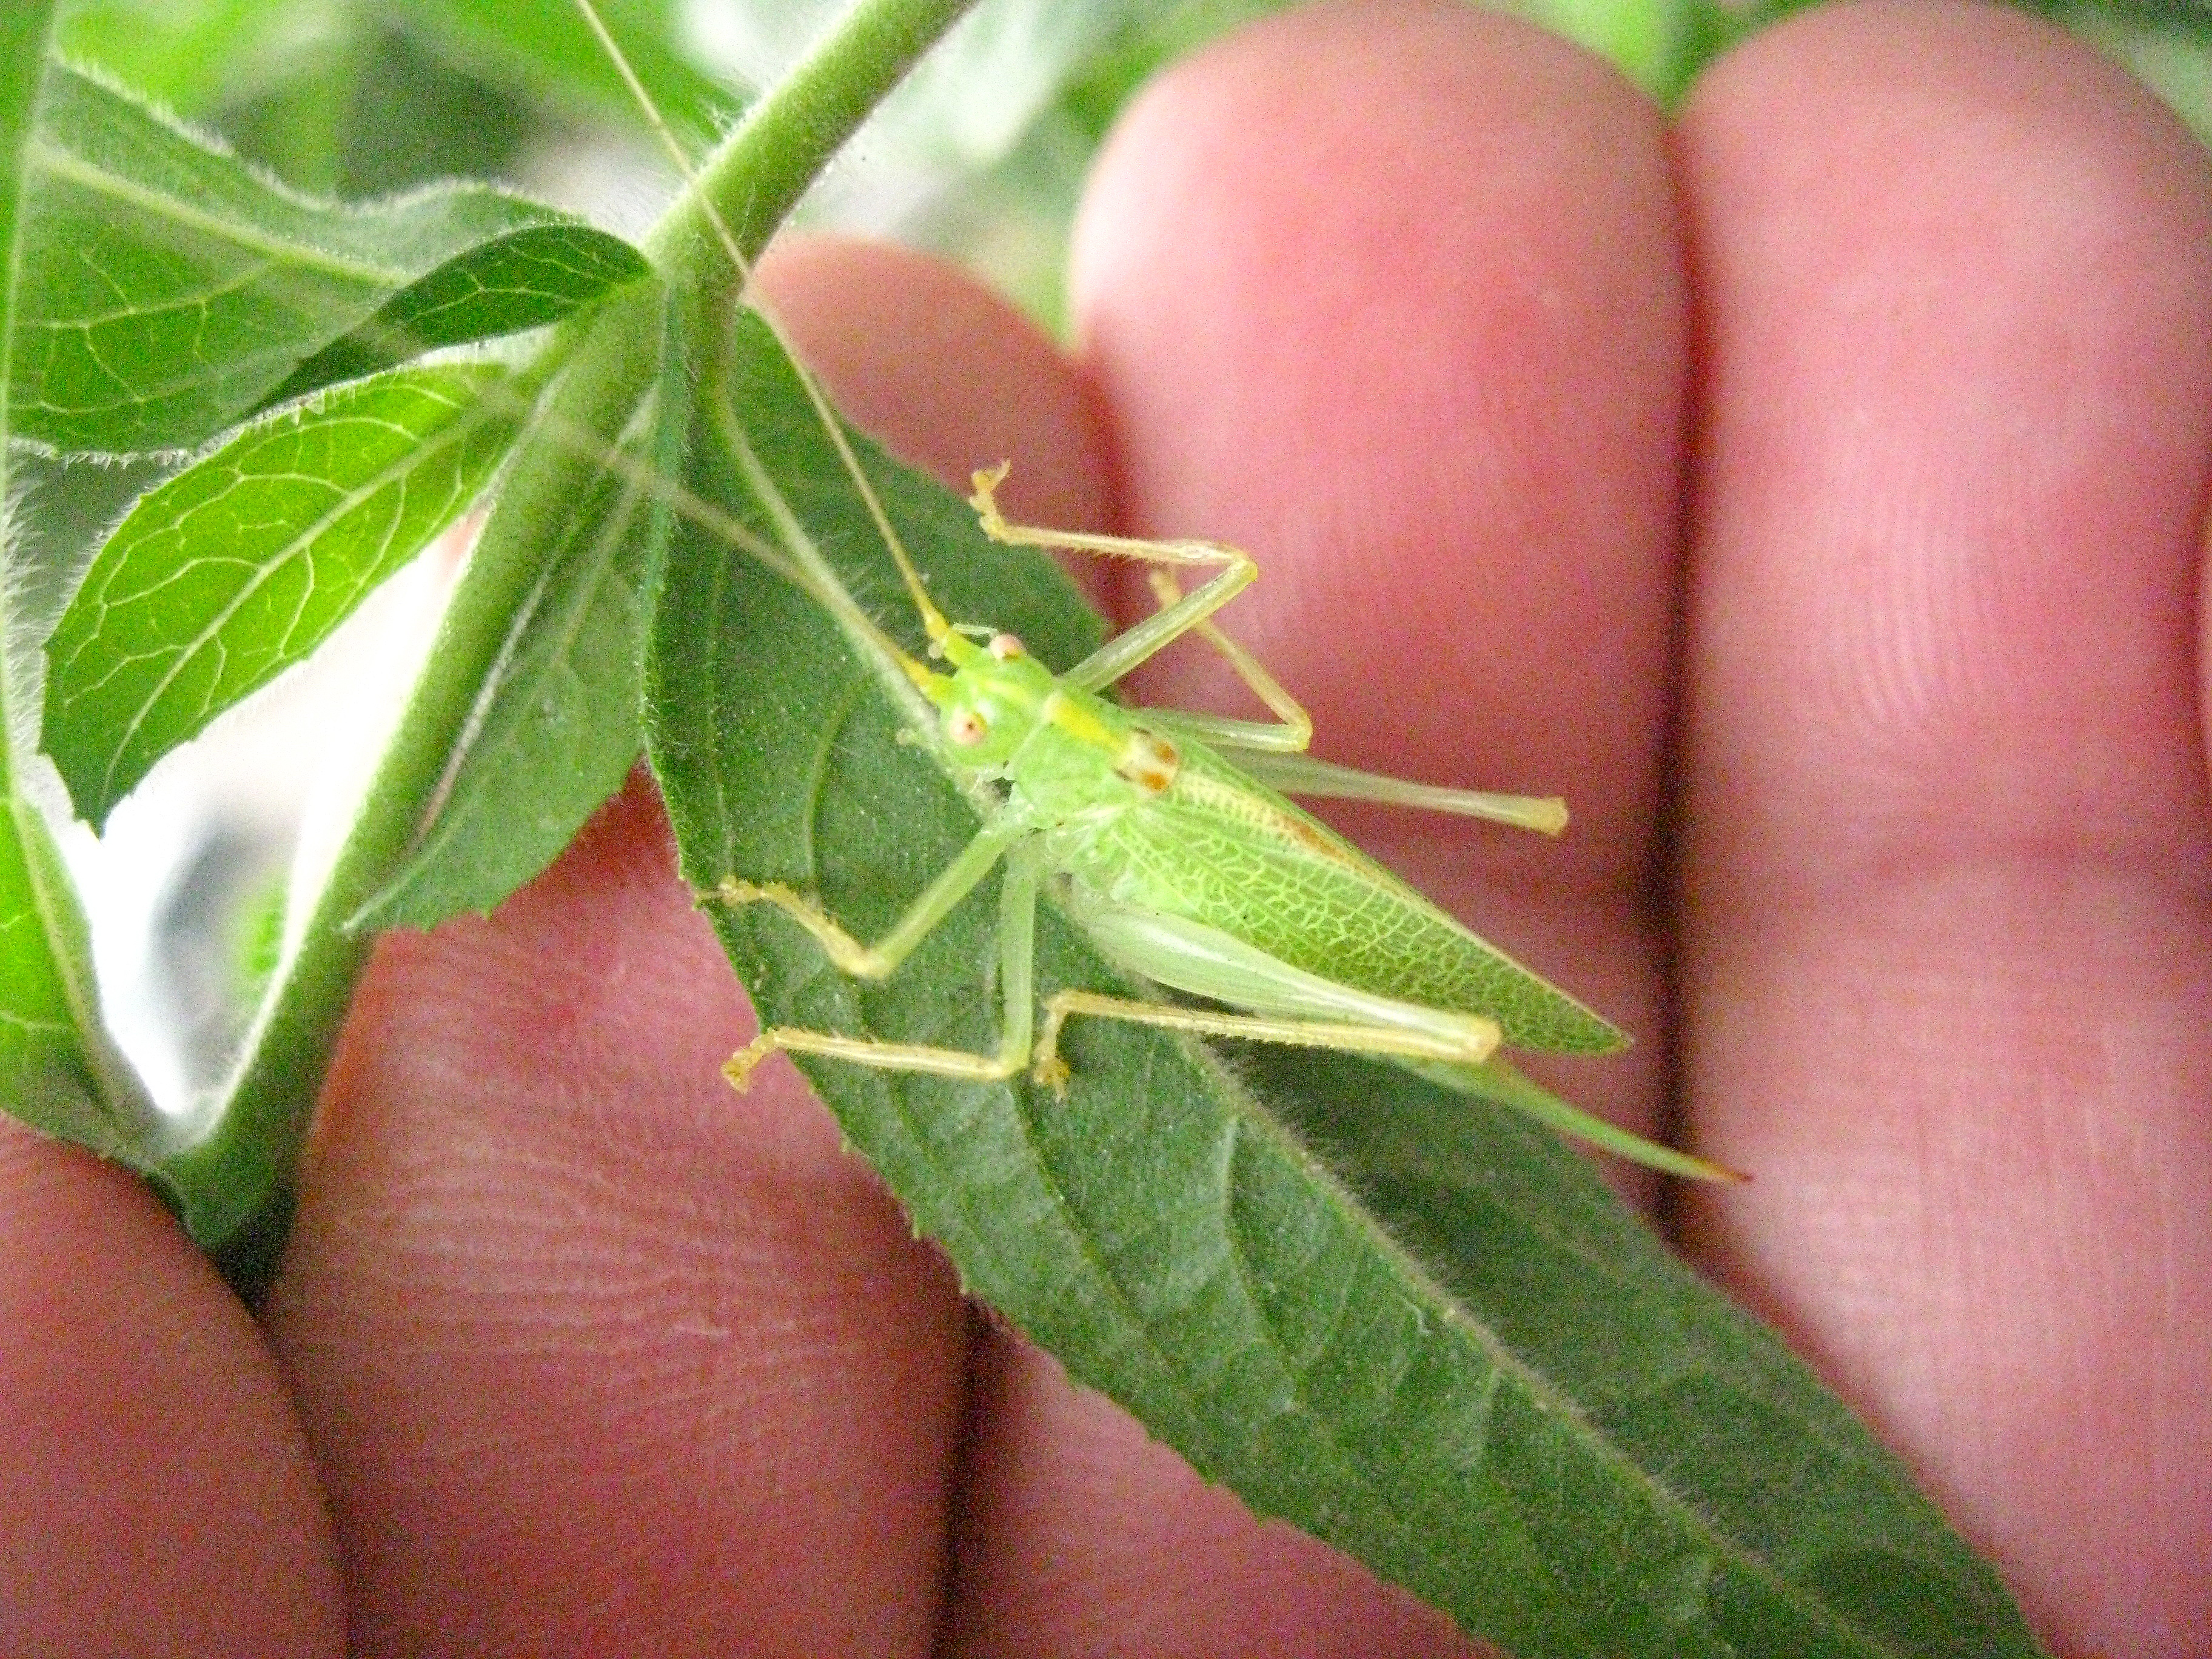 NaturePlus: What type of Cricket?